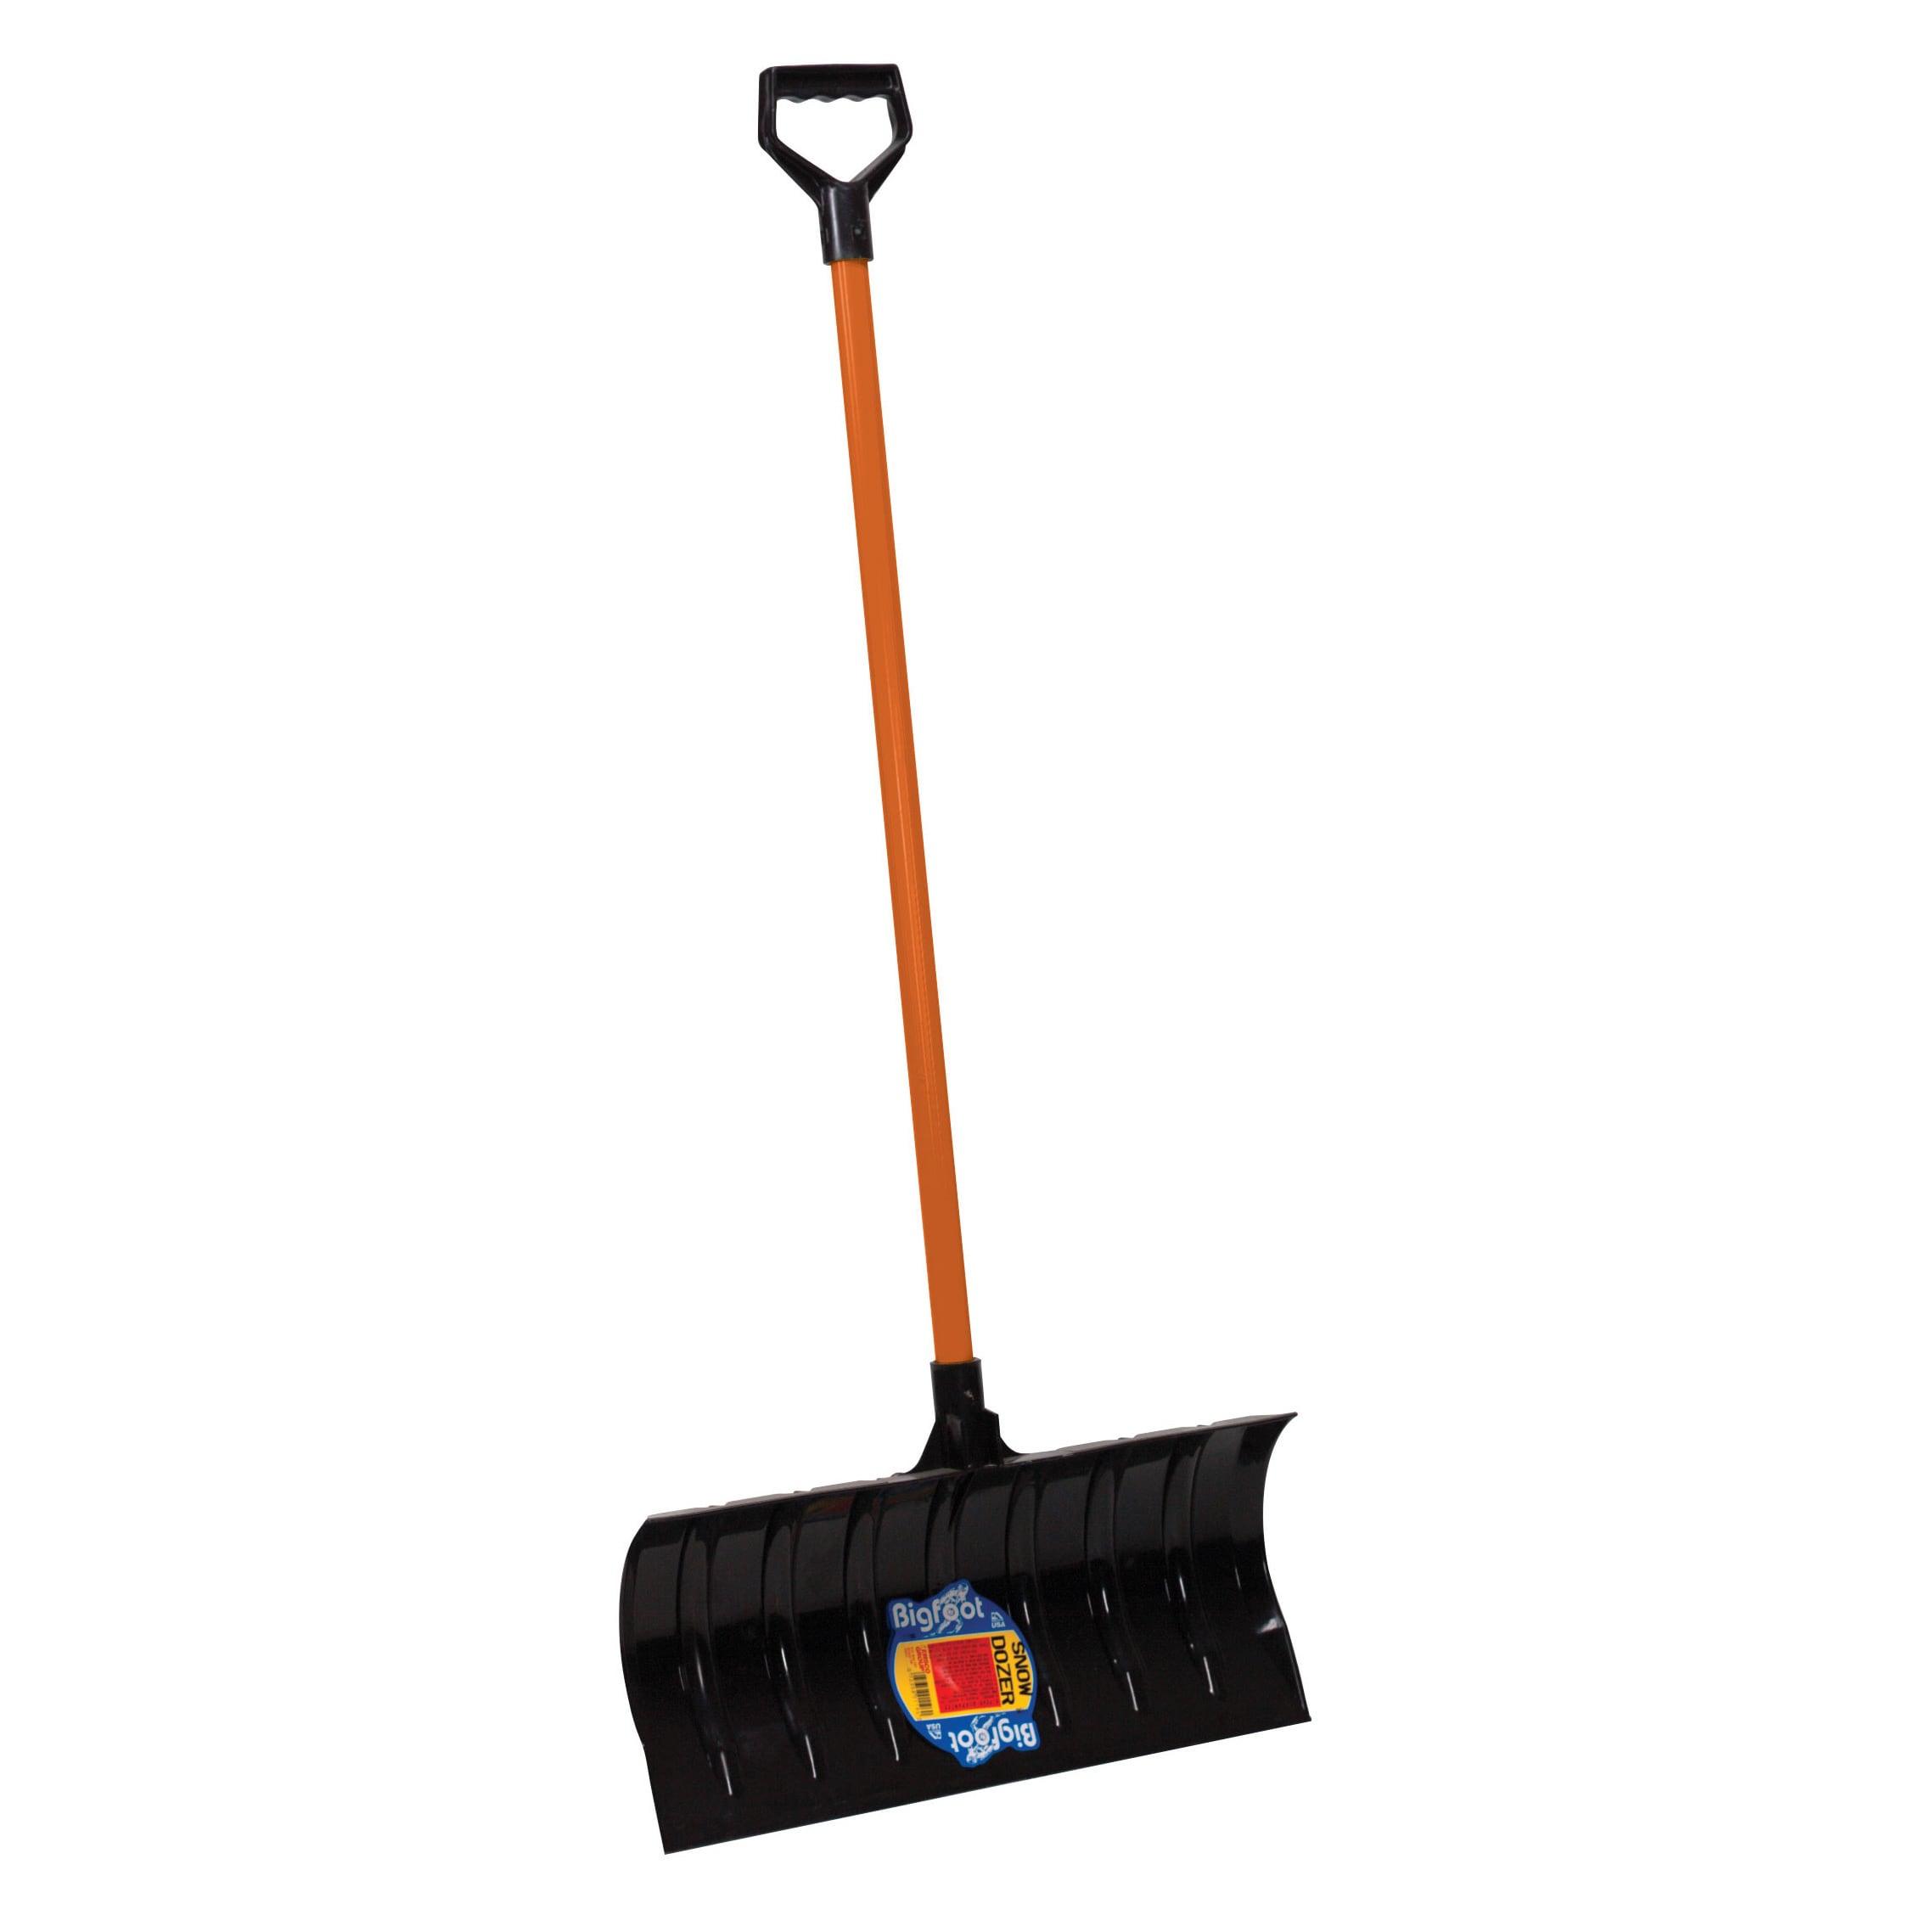 Razorback 81104 4-inch X 9-inch Scraper (Snow Shovels), M...